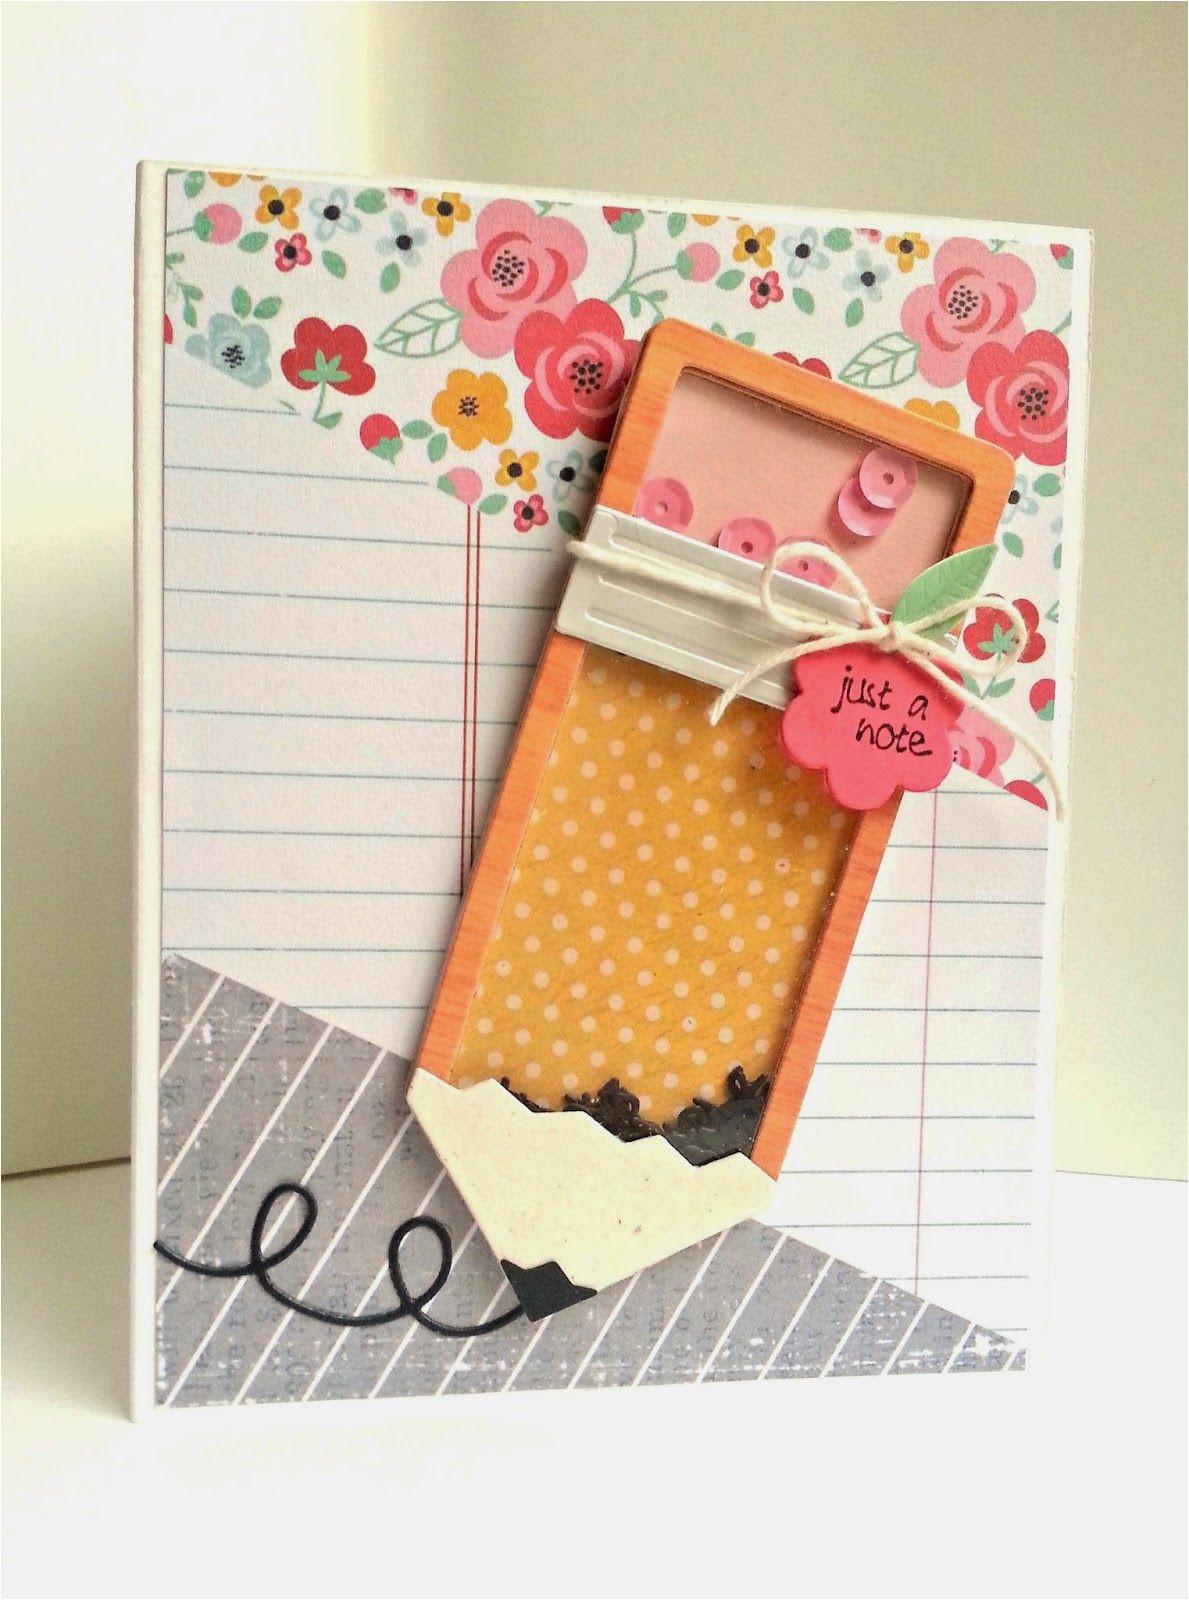 Teachers Day Pop Up Card Pencil Shaker with Images Teacher Cards Teacher